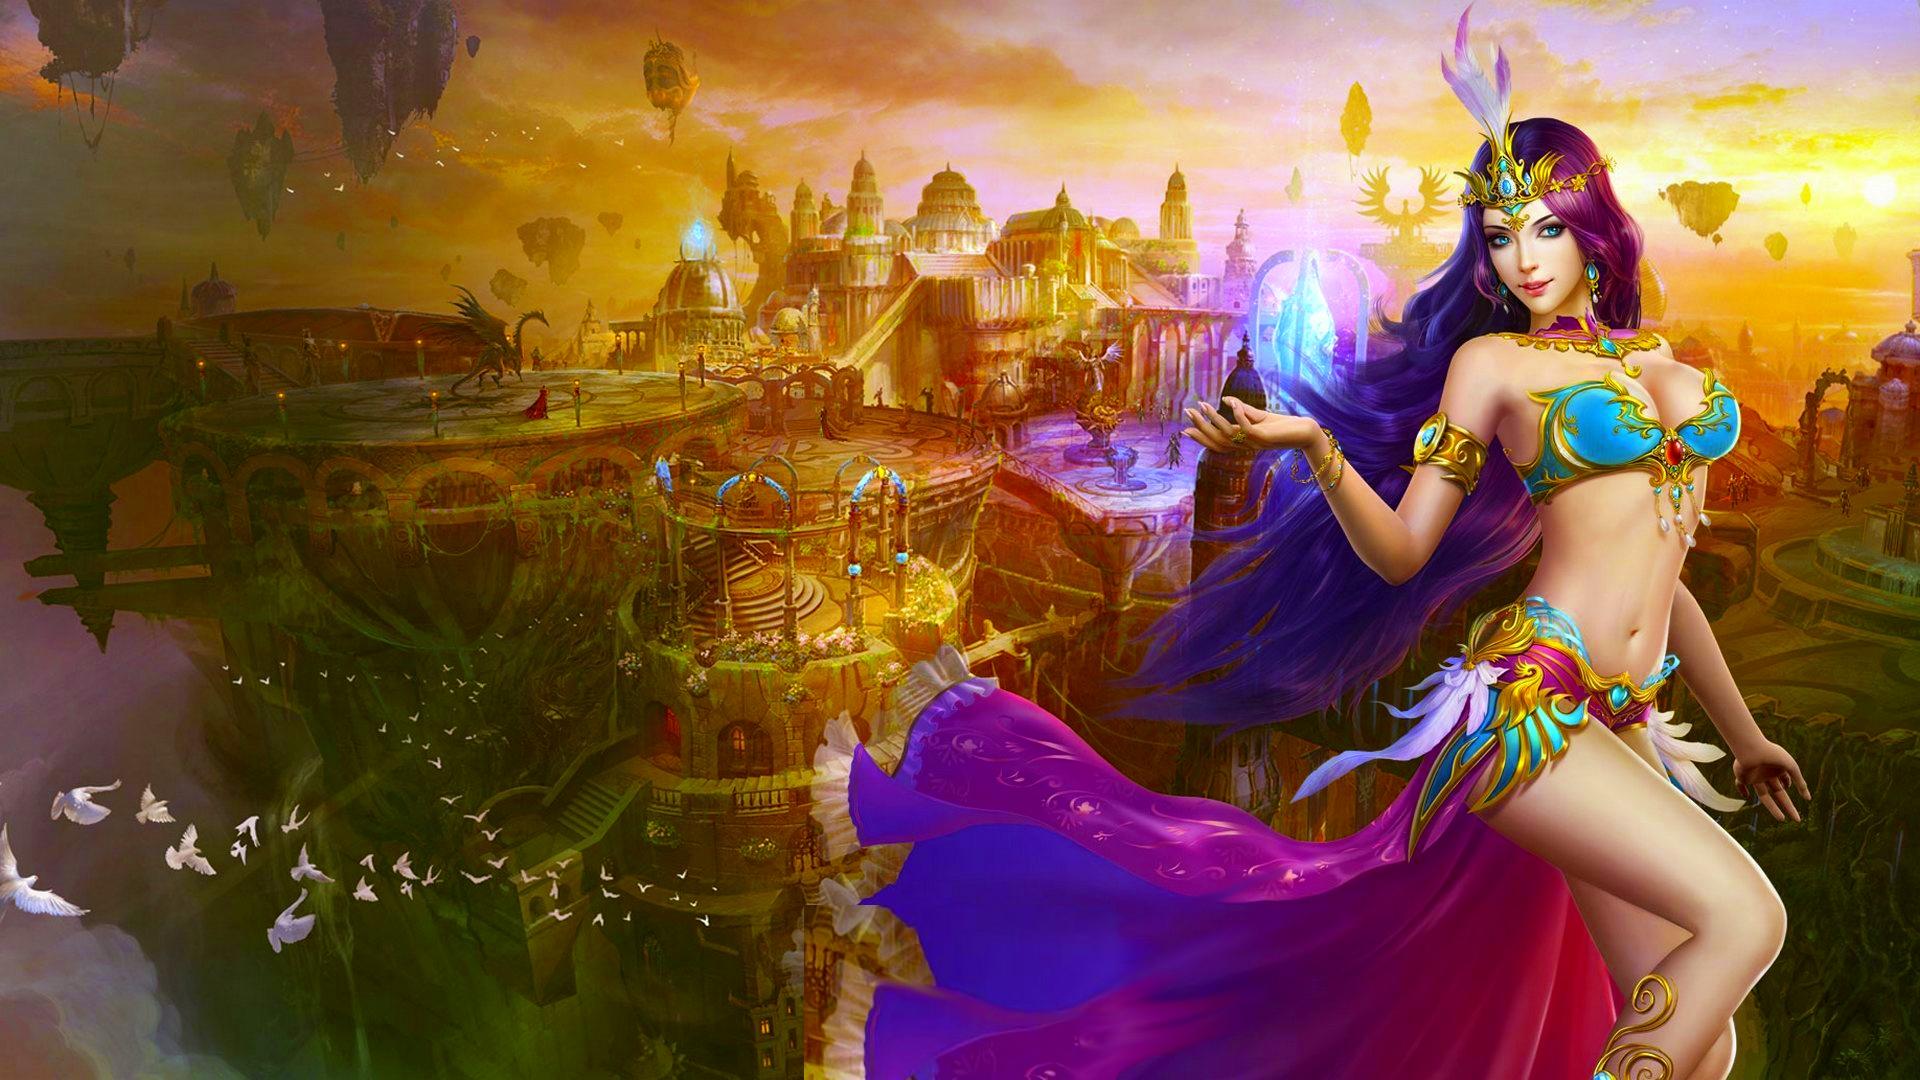 princess girl wallpaper - photo #8